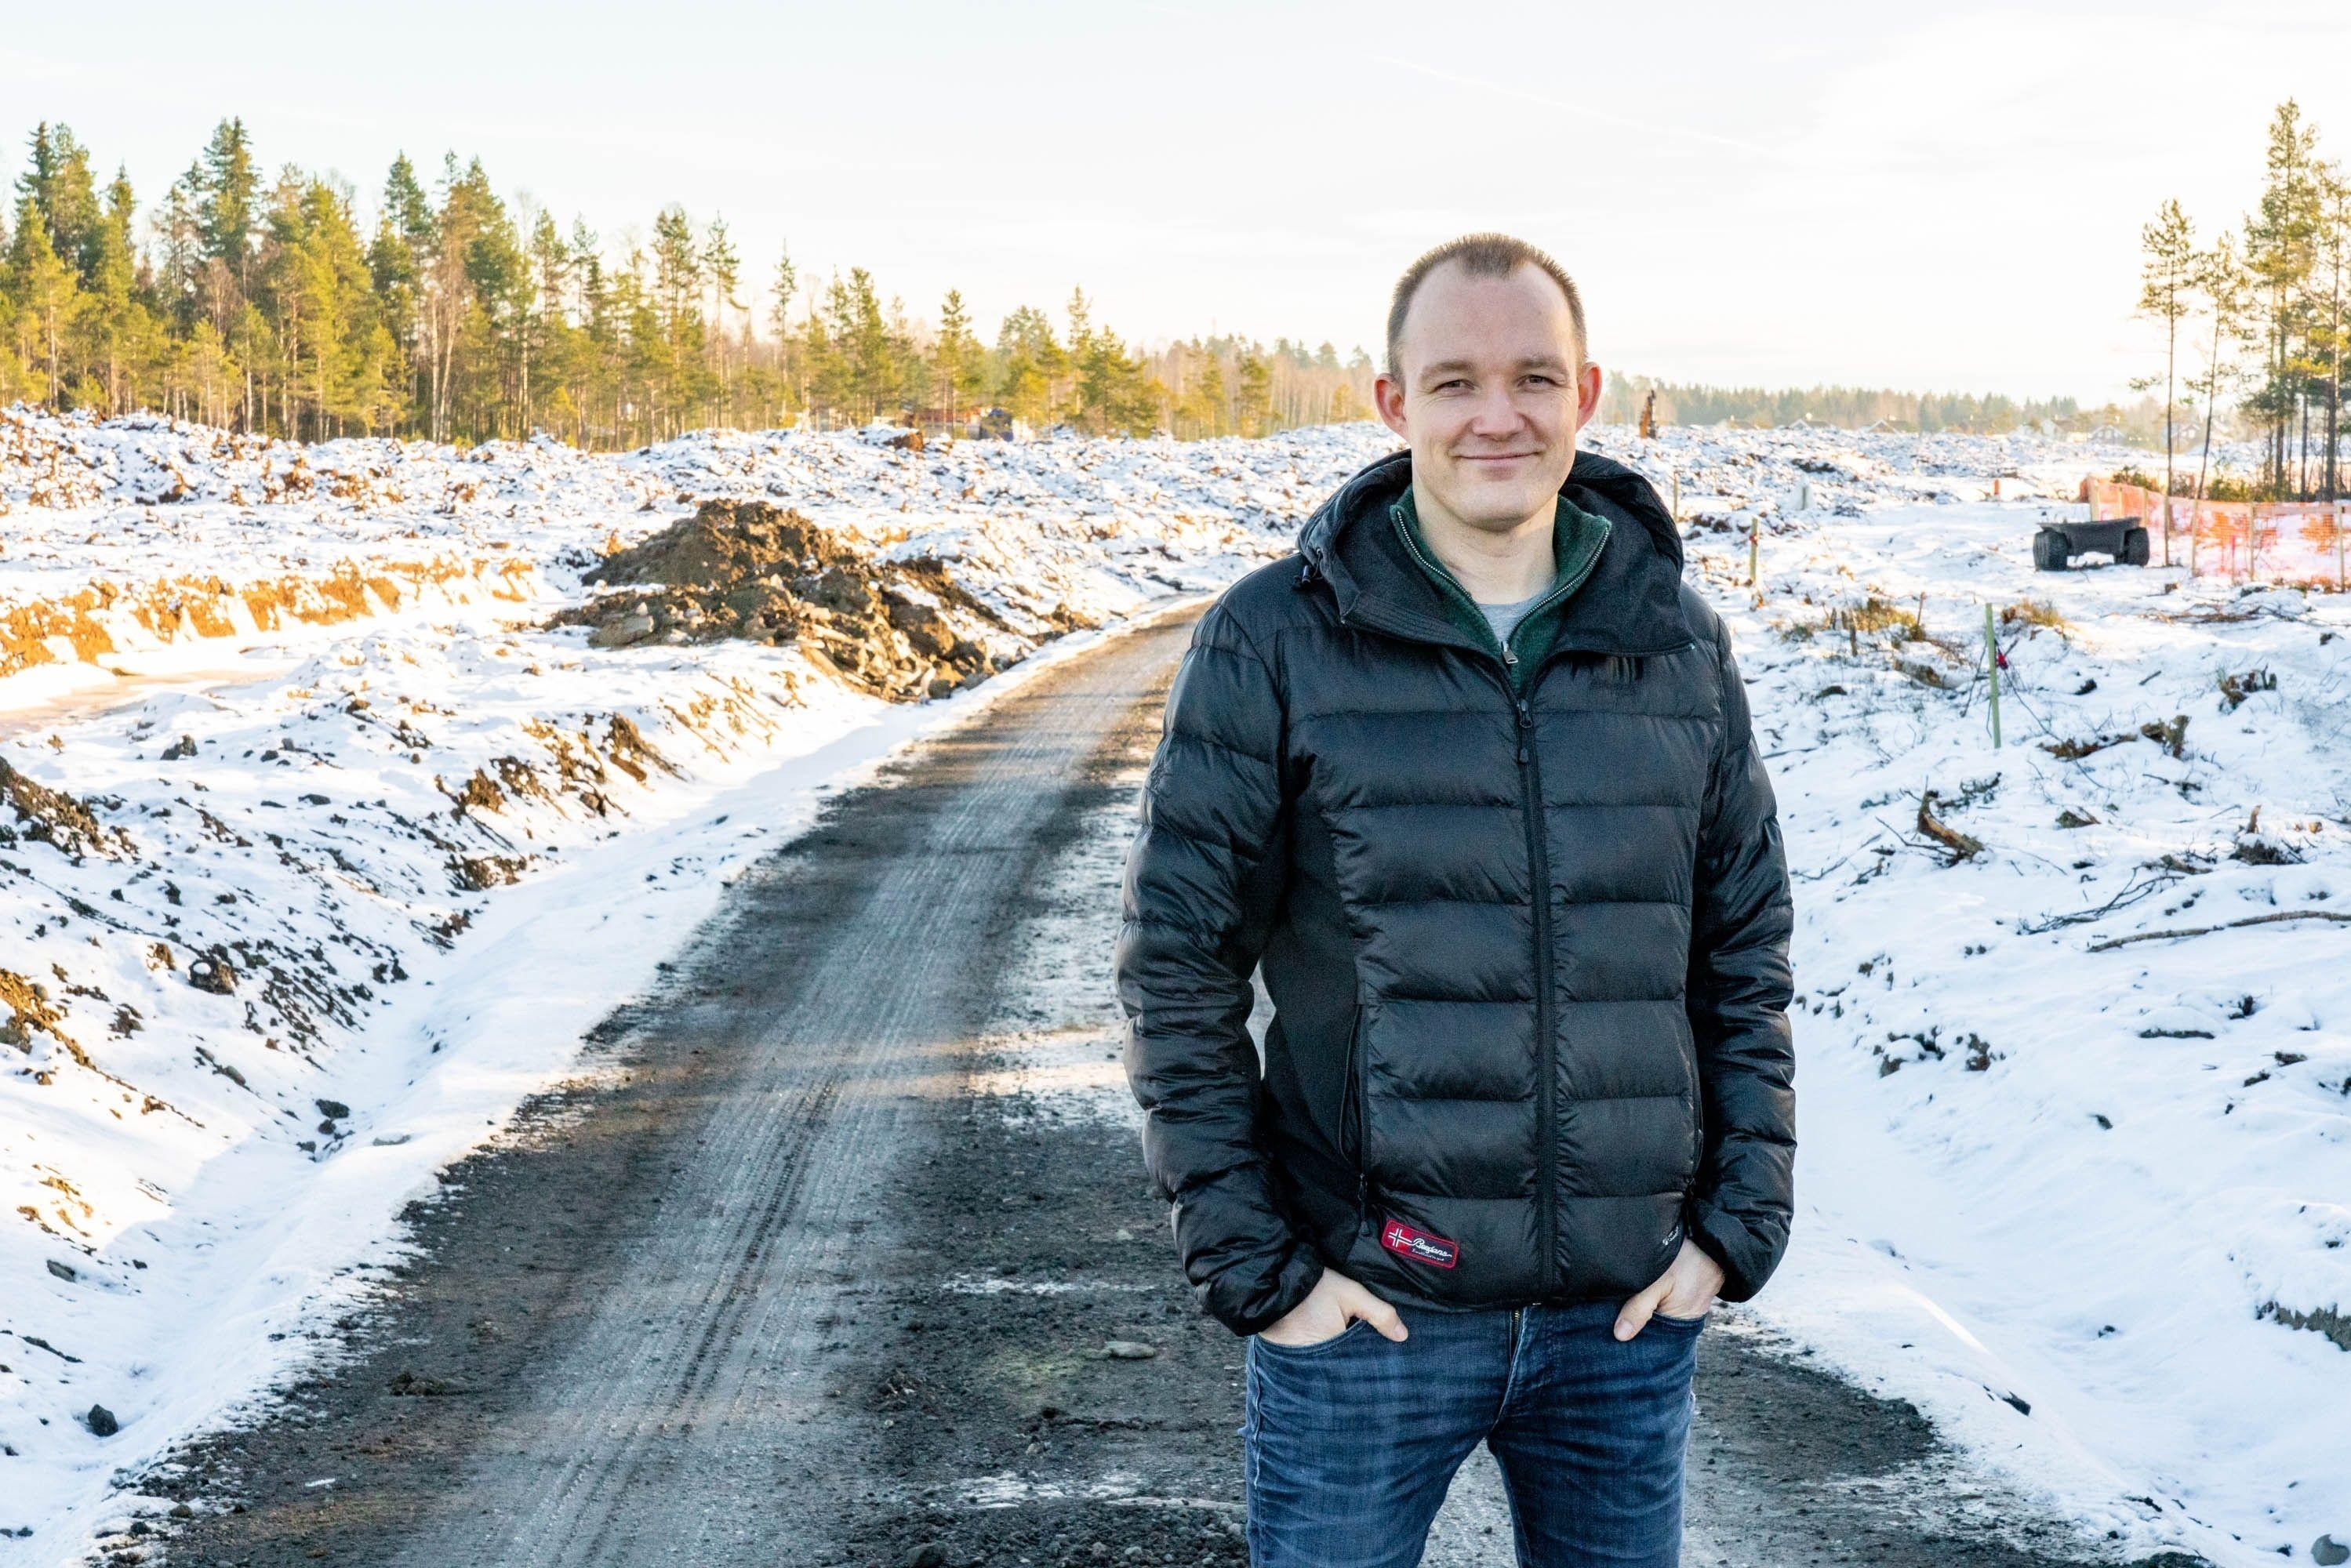 Tor Eivind Nordby Vik viser frem området Bjørkeåsen som er under utvikling.